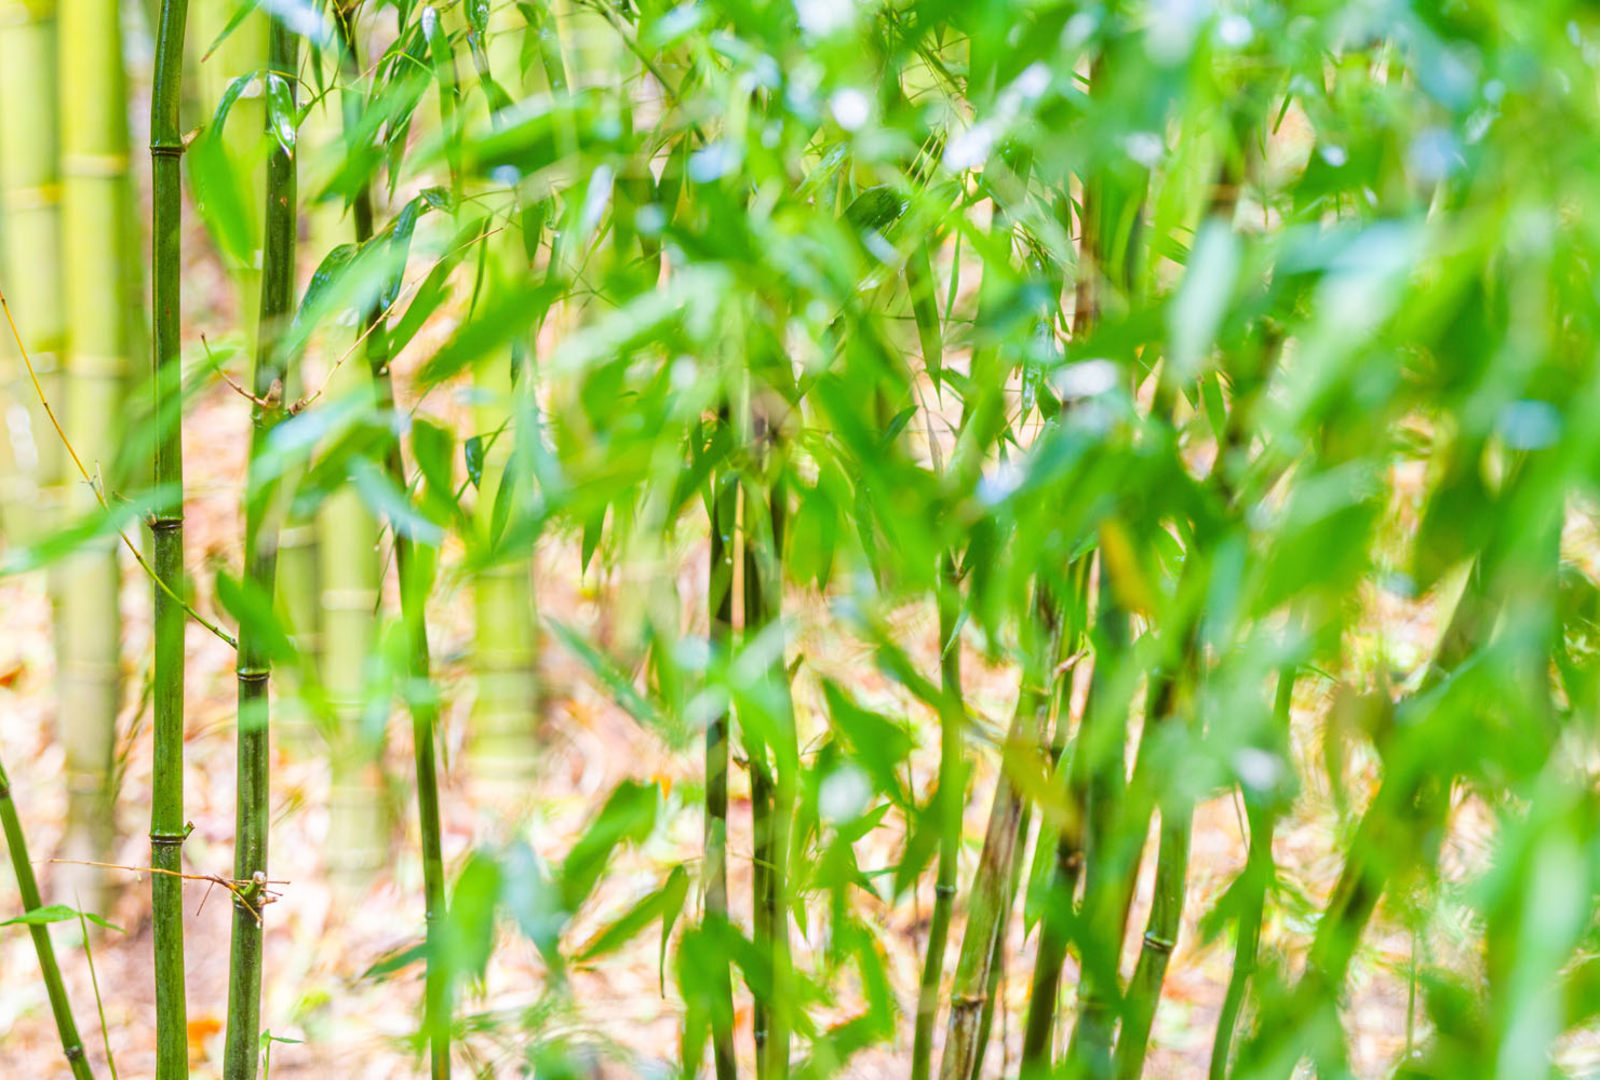 Phyllostachys aureosulcata bamboo at trebah